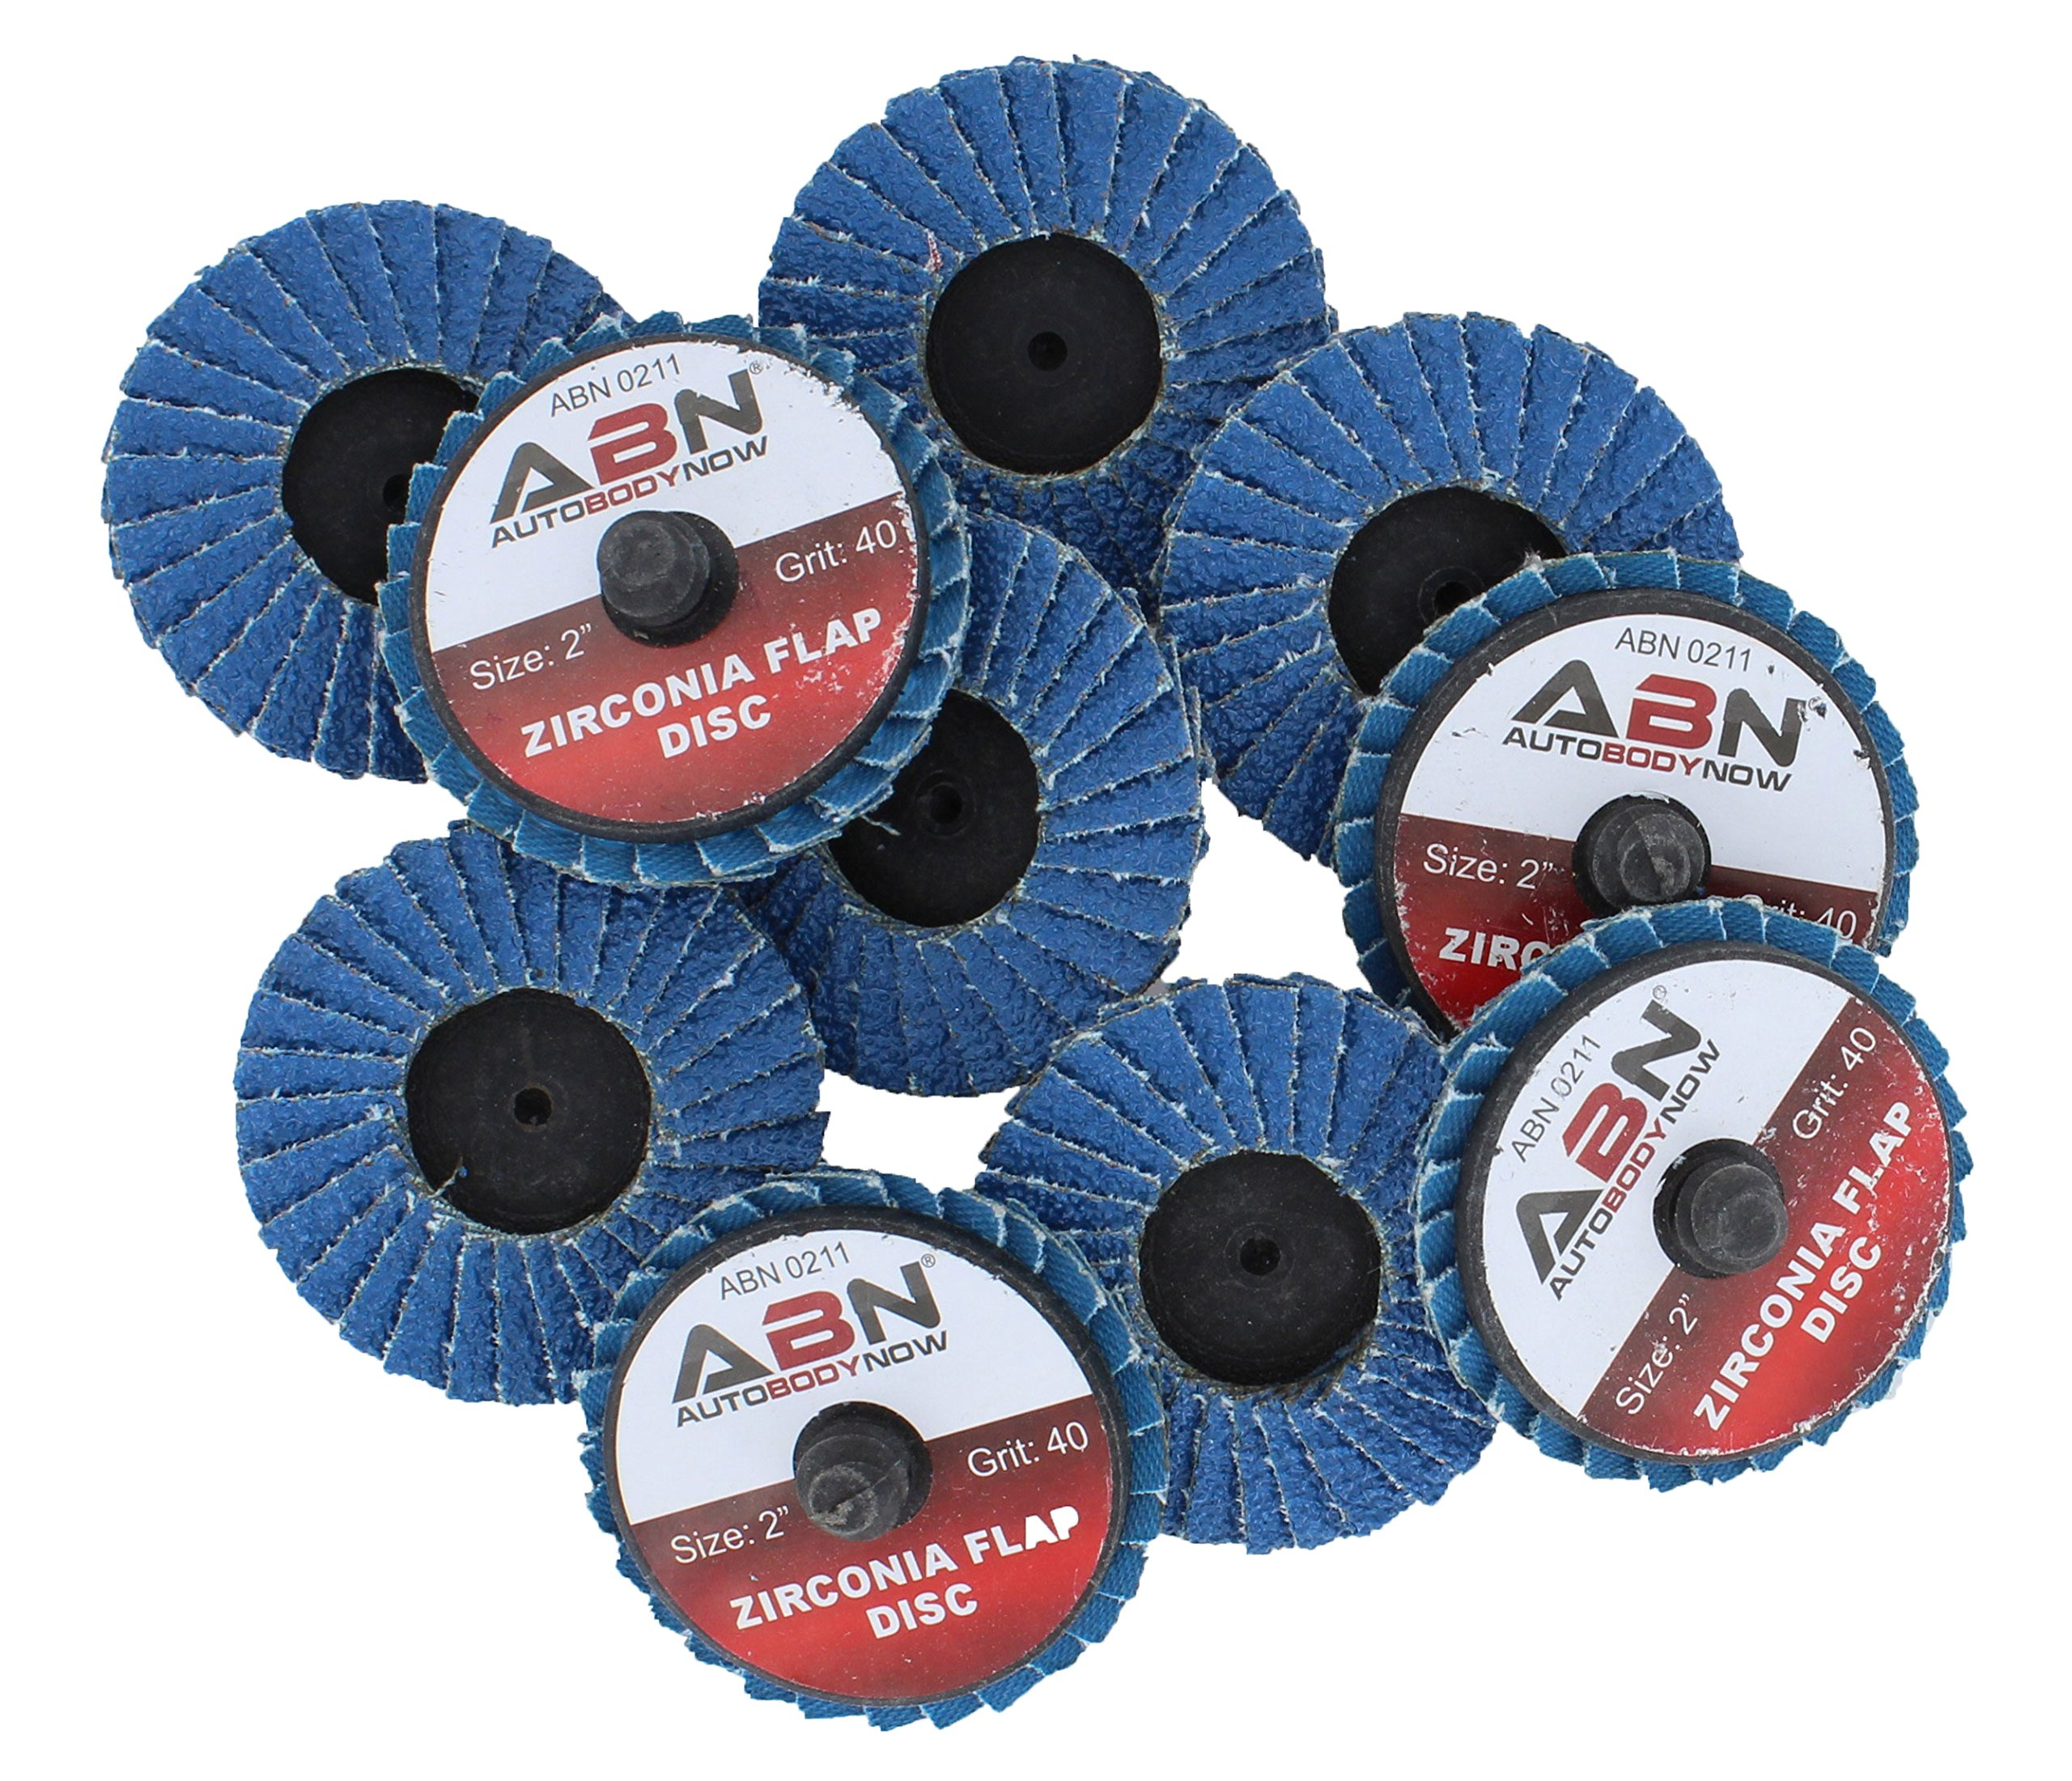 ABN 2in T27 40 Grit High Density Zirconia Alumina Flat Flap Disc Roloc Roll Lock Grinding Sanding Sandpaper Wheels 10 PK by ABN